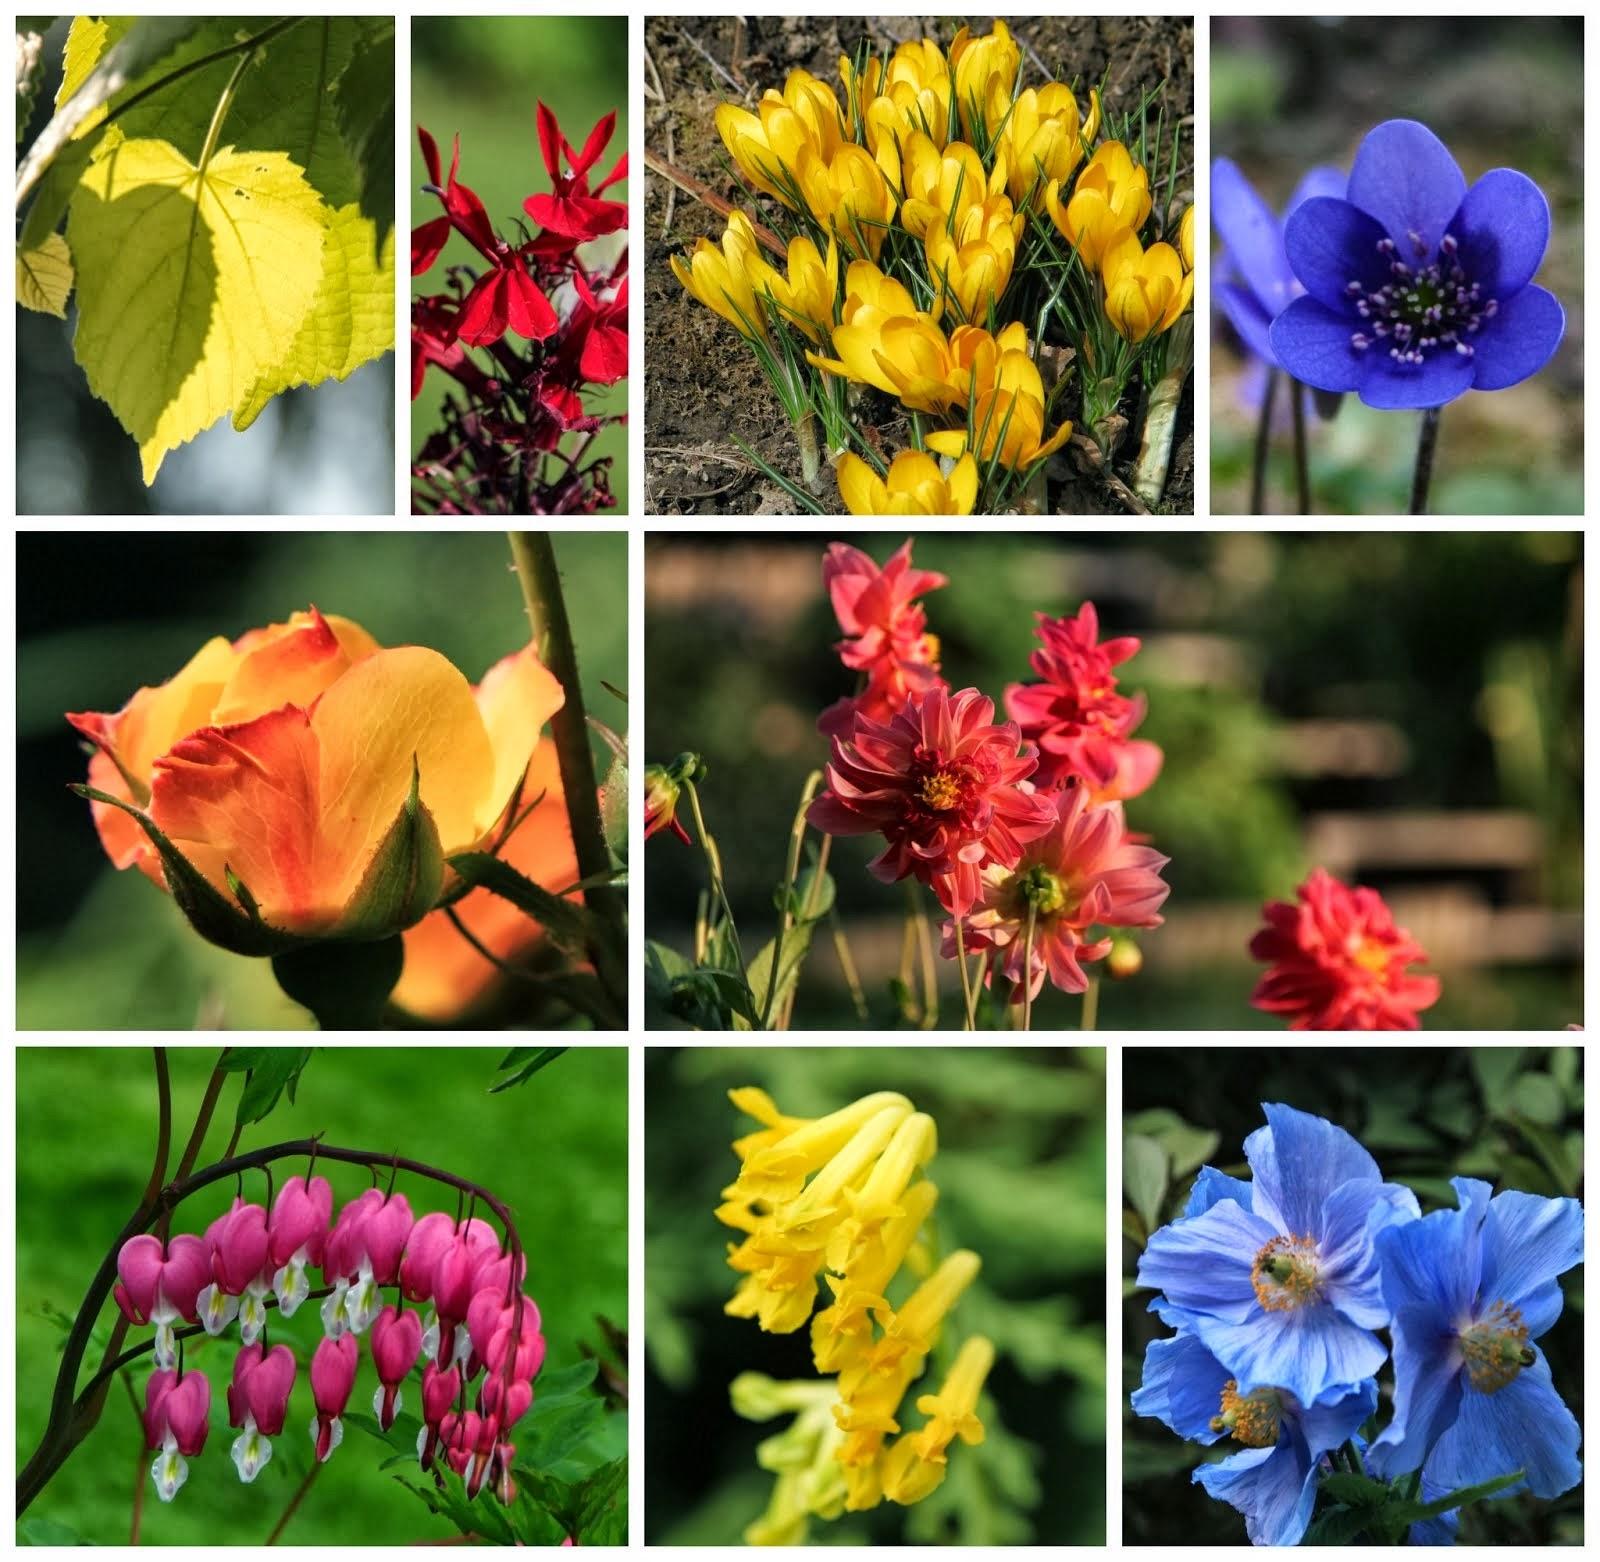 Charlottas trädgårdsfärger